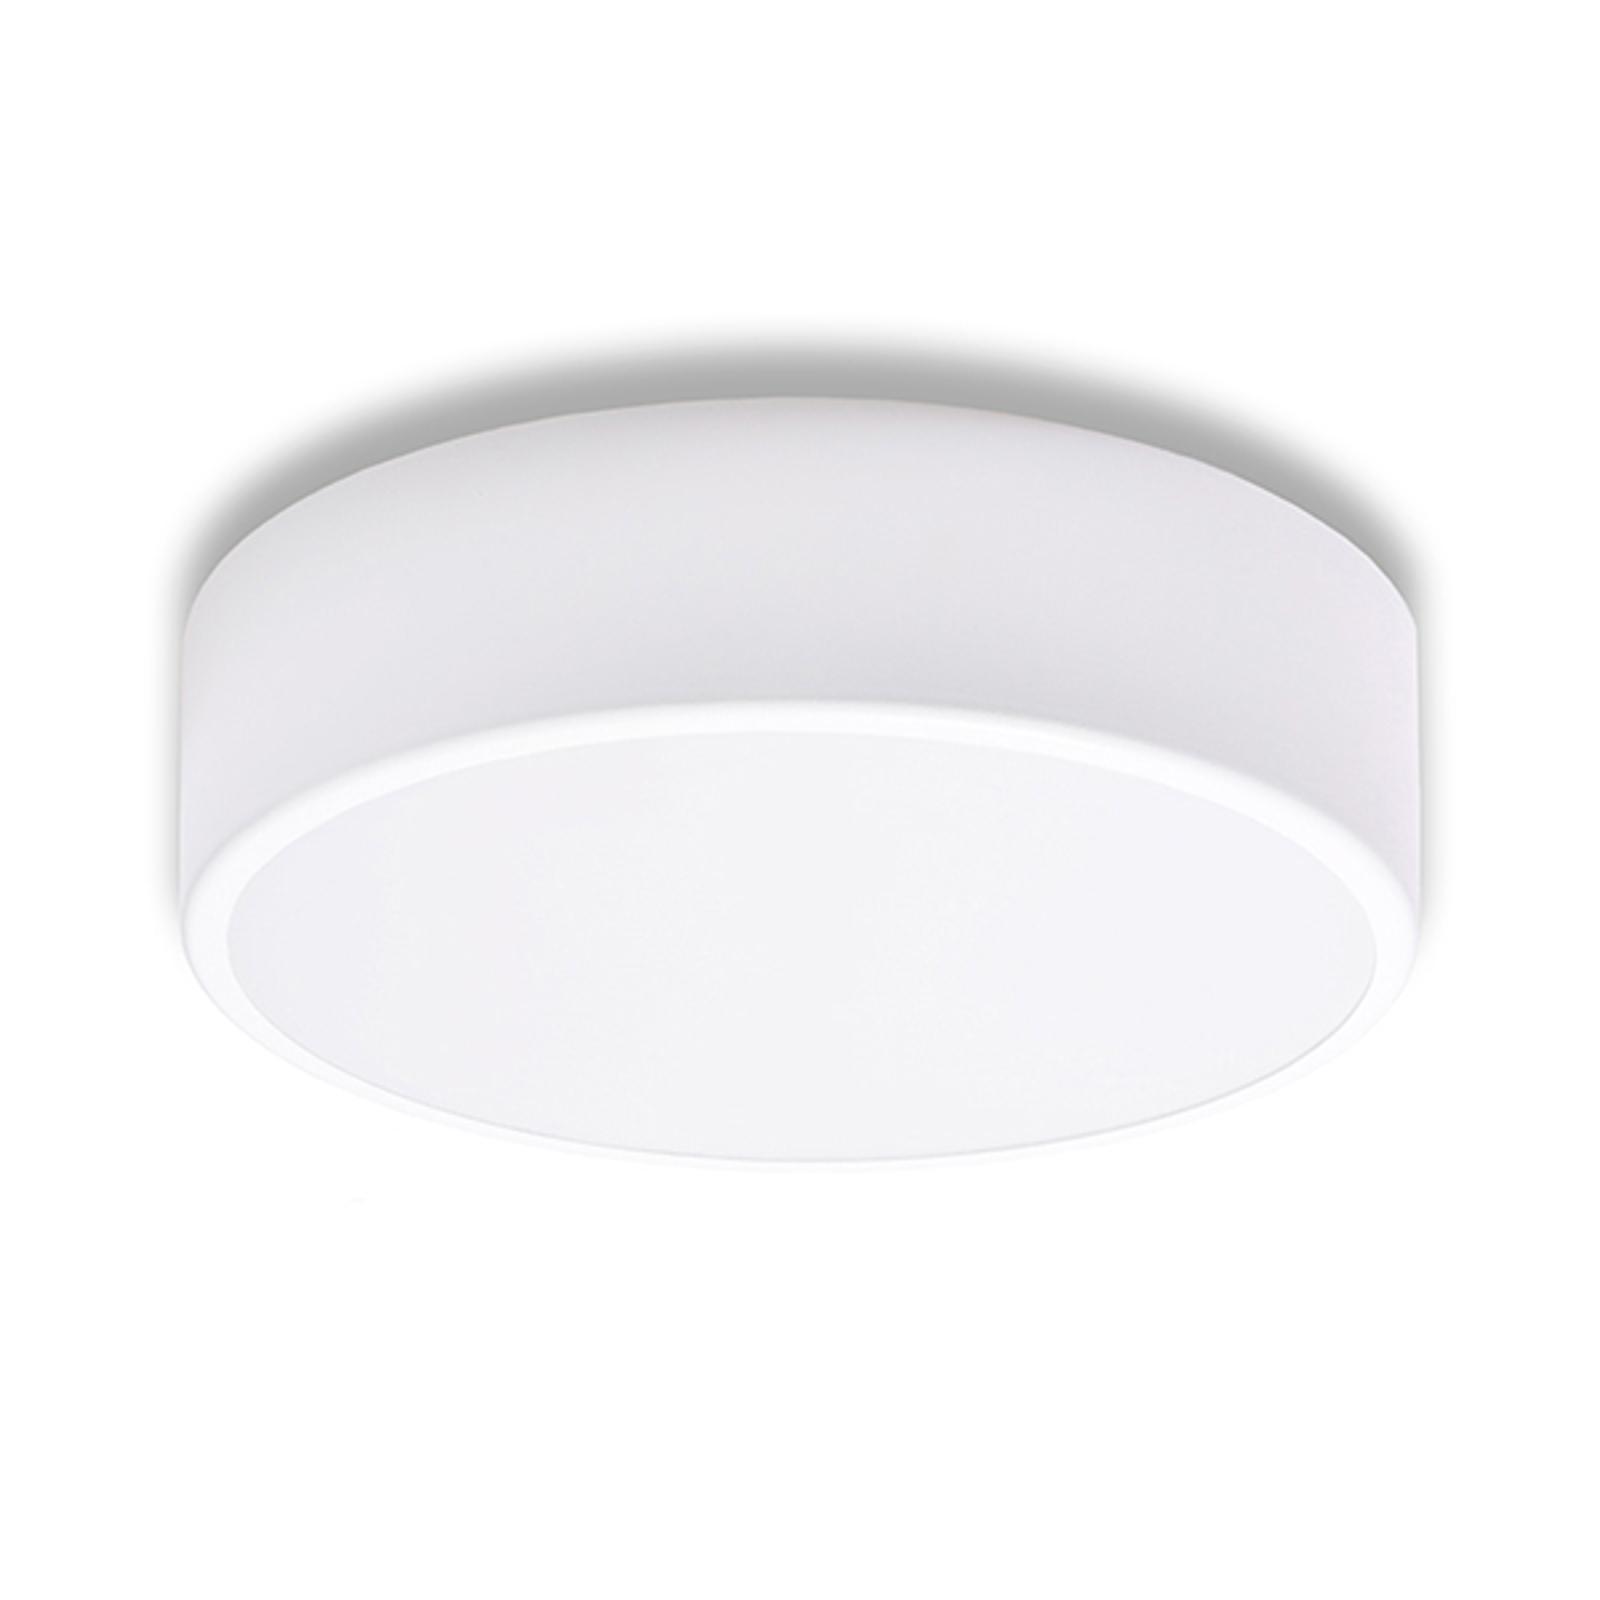 Cleo loftlampe, Ø 30 cm, hvid